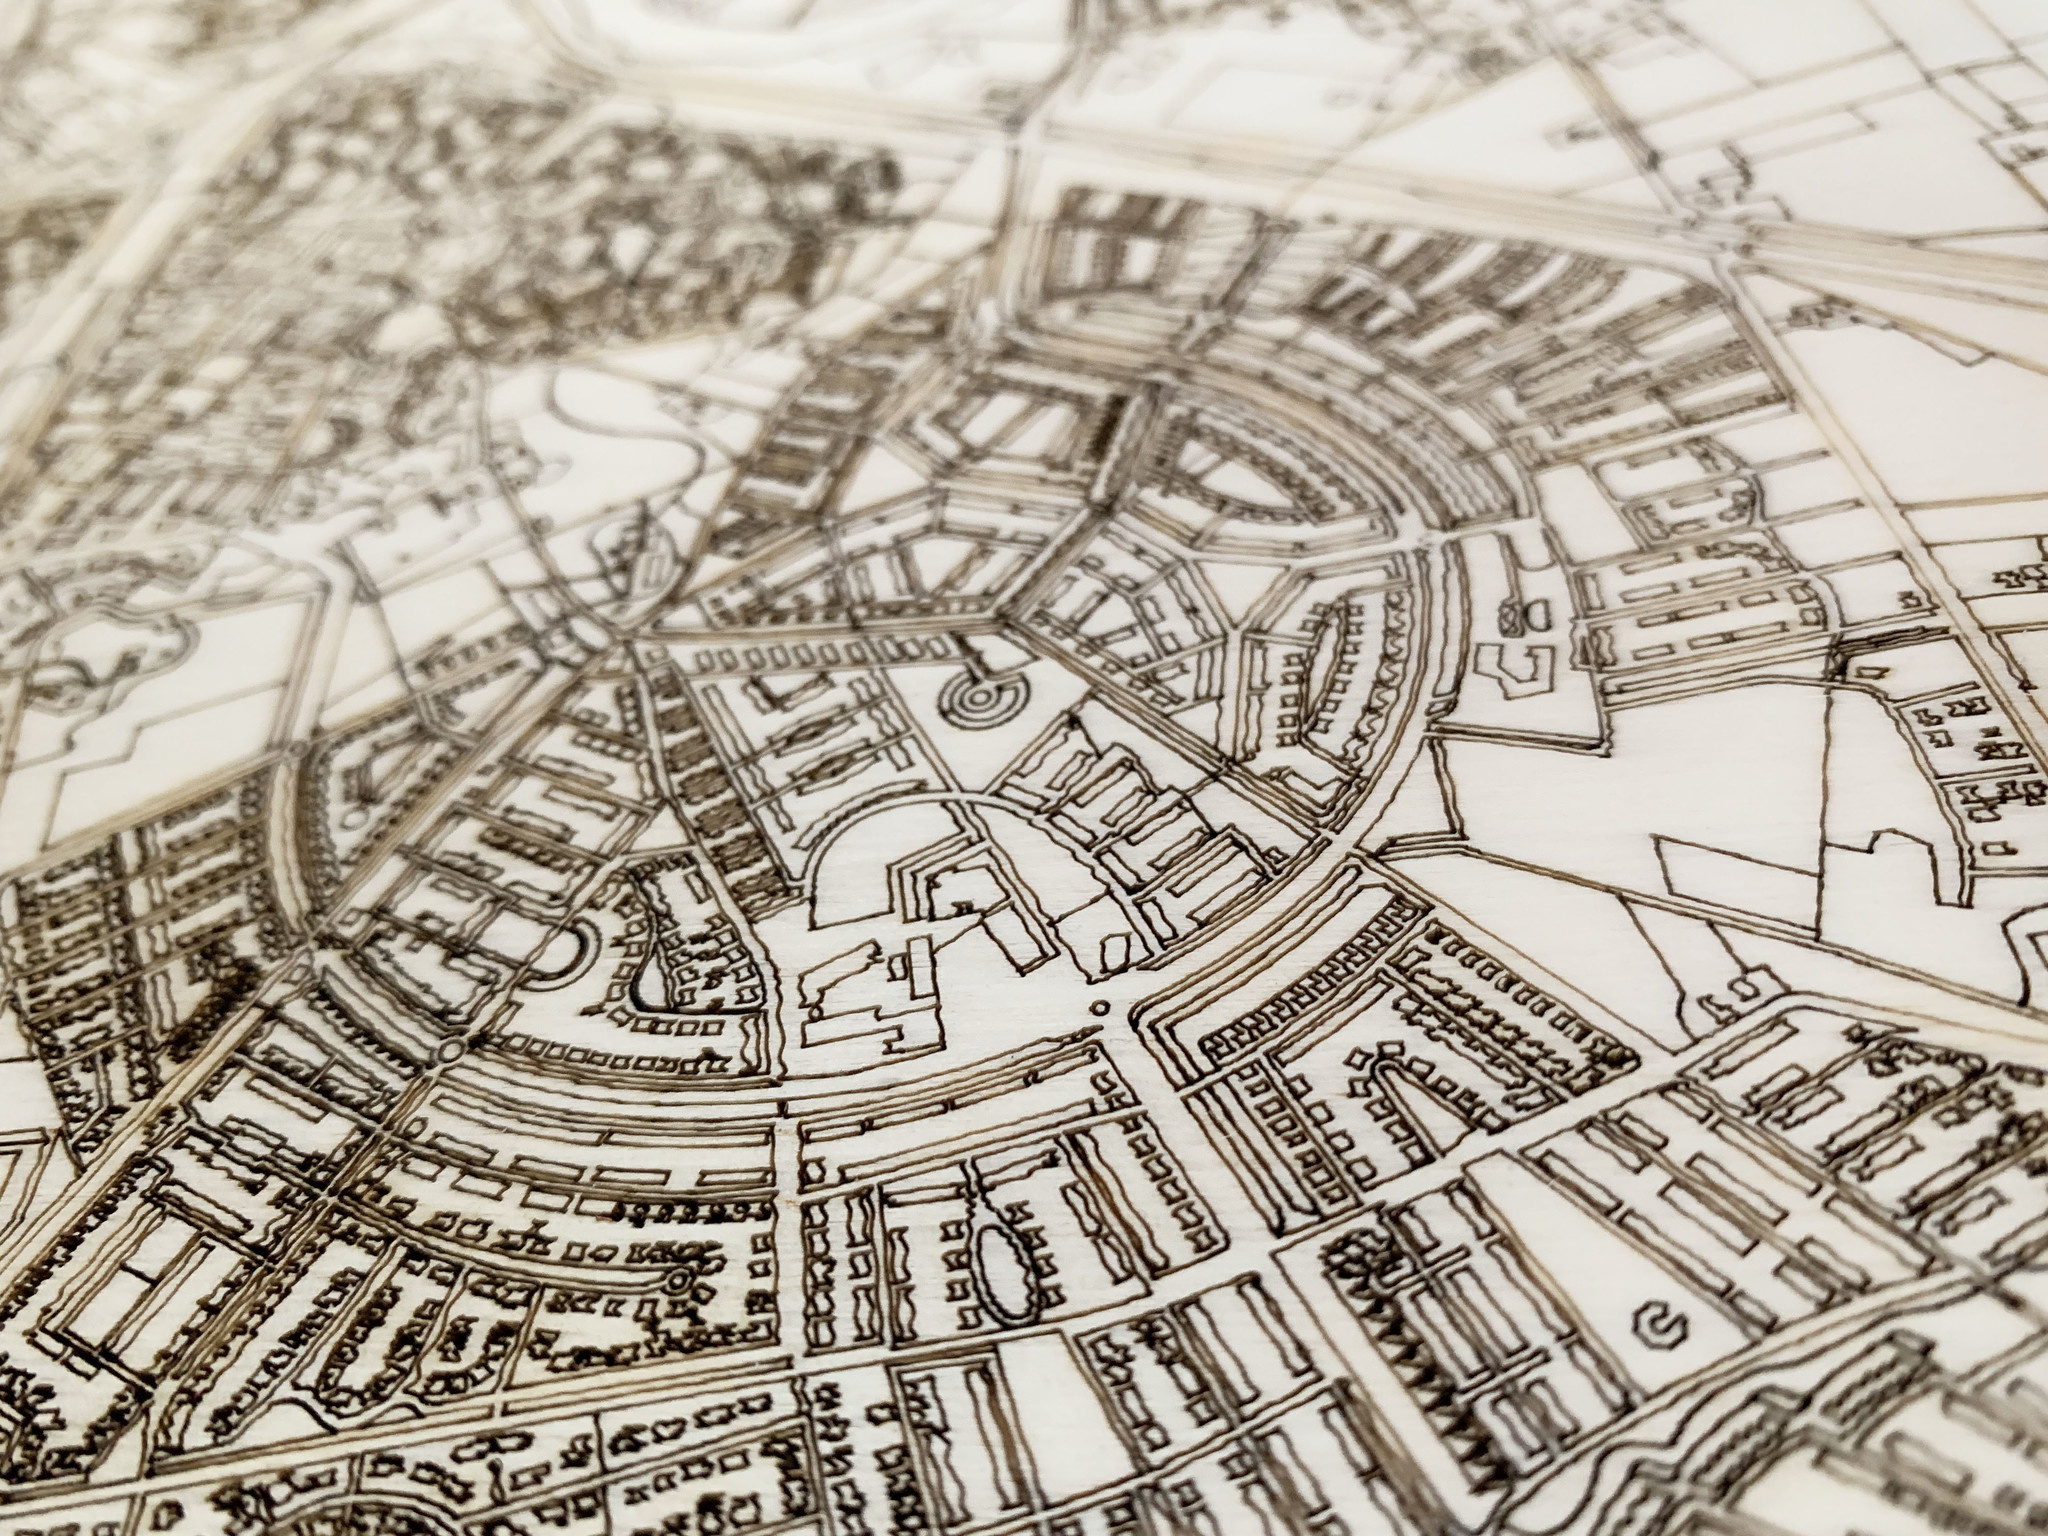 Stadtplan Vaassen | Wanddekoration Holz-4